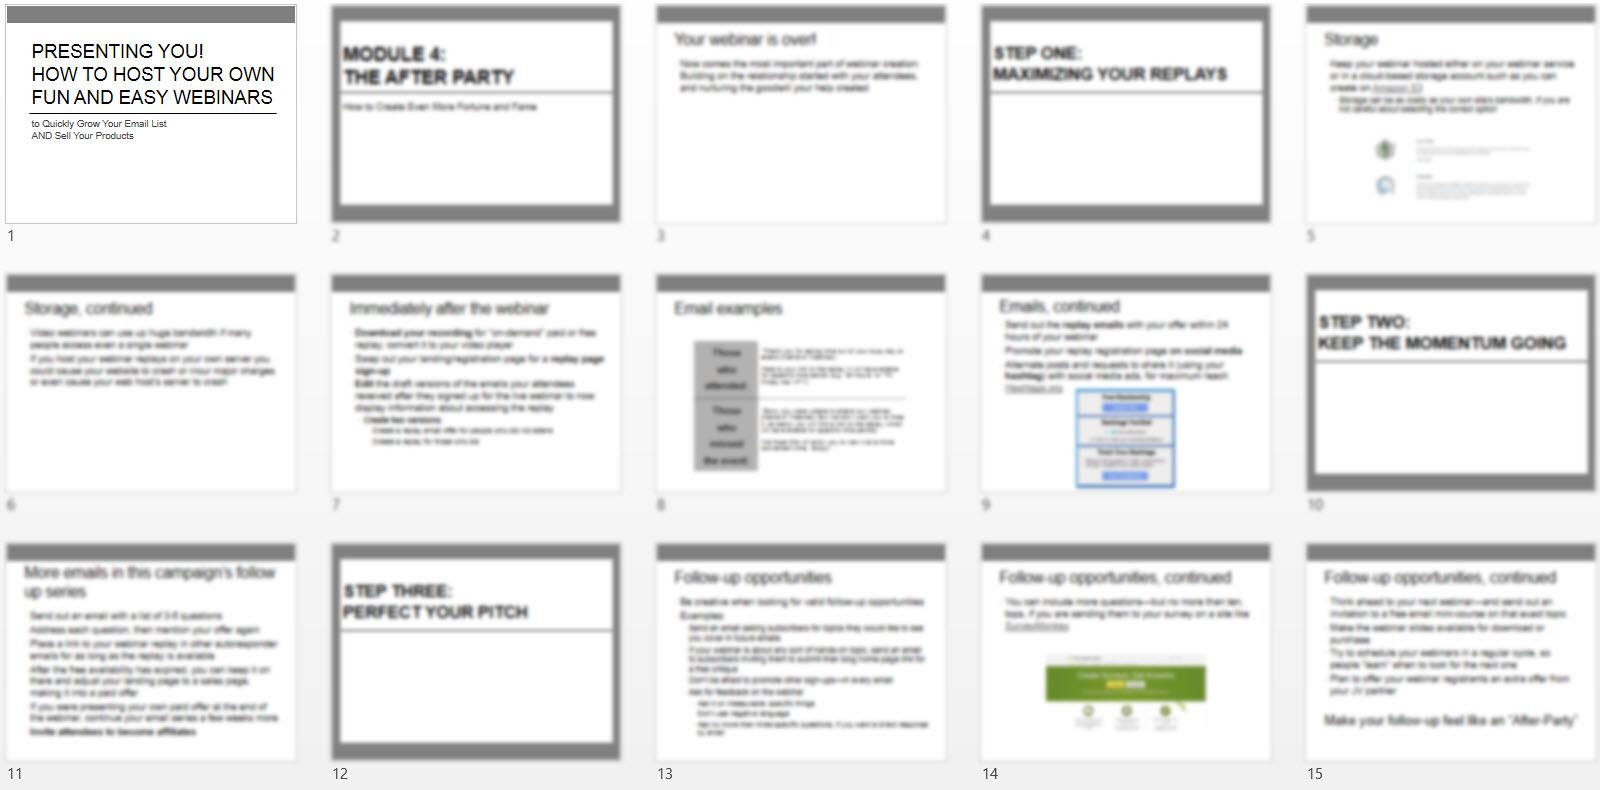 module 4 slides screenshot